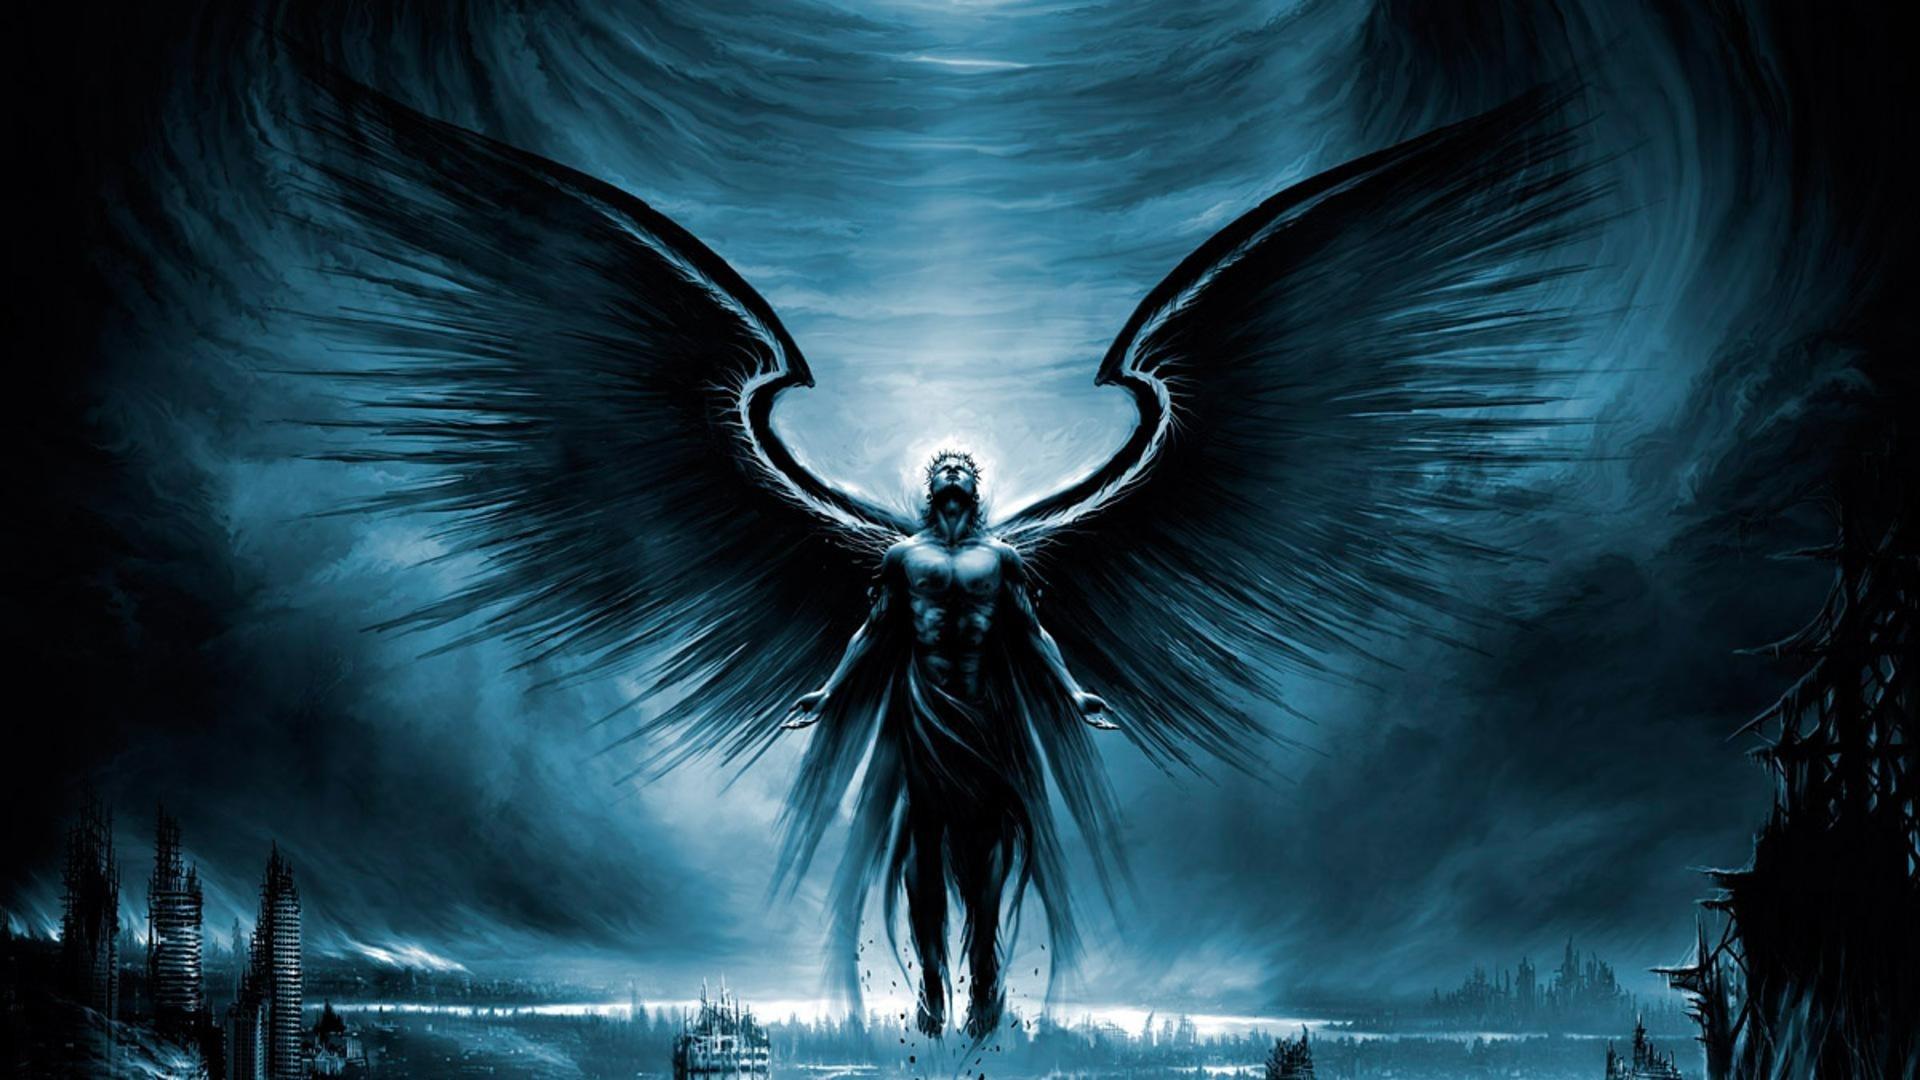 Dark Angel HD Wallpaper HD 1080p wallpapers55com   Best Wallpapers 1920x1080